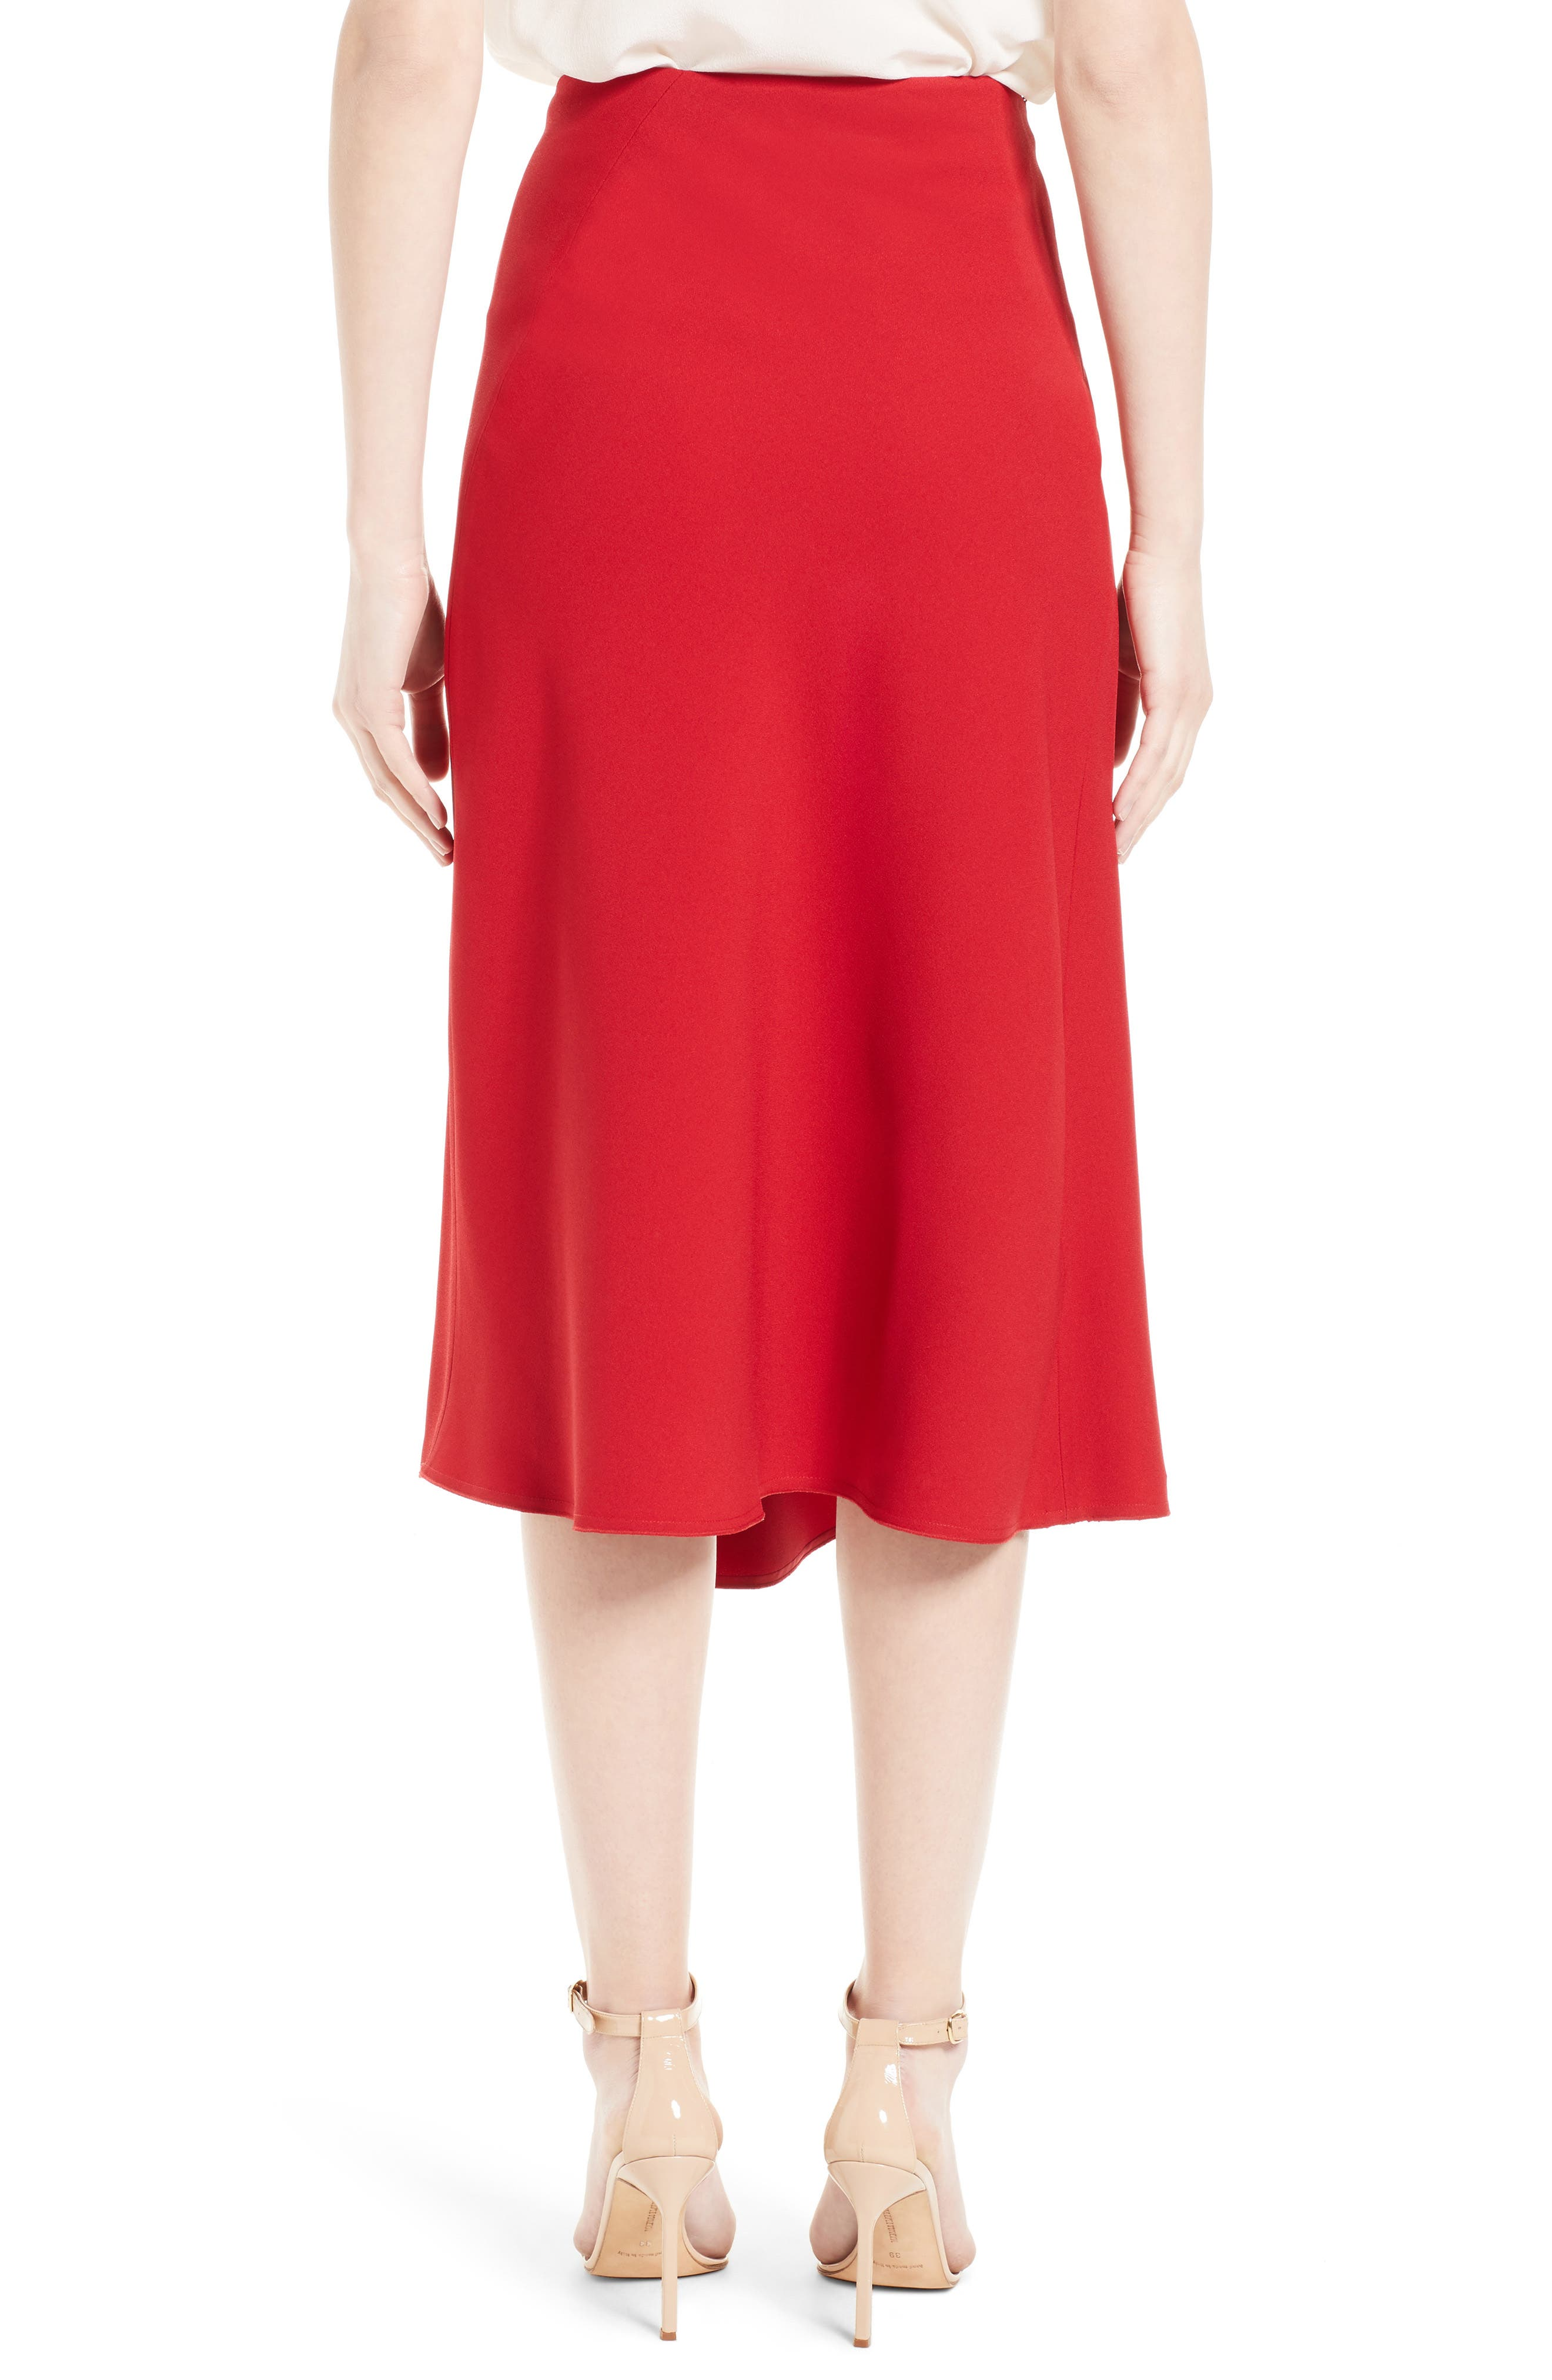 Alternate Image 2  - Victoria Beckham Satin Crepe Godet Skirt